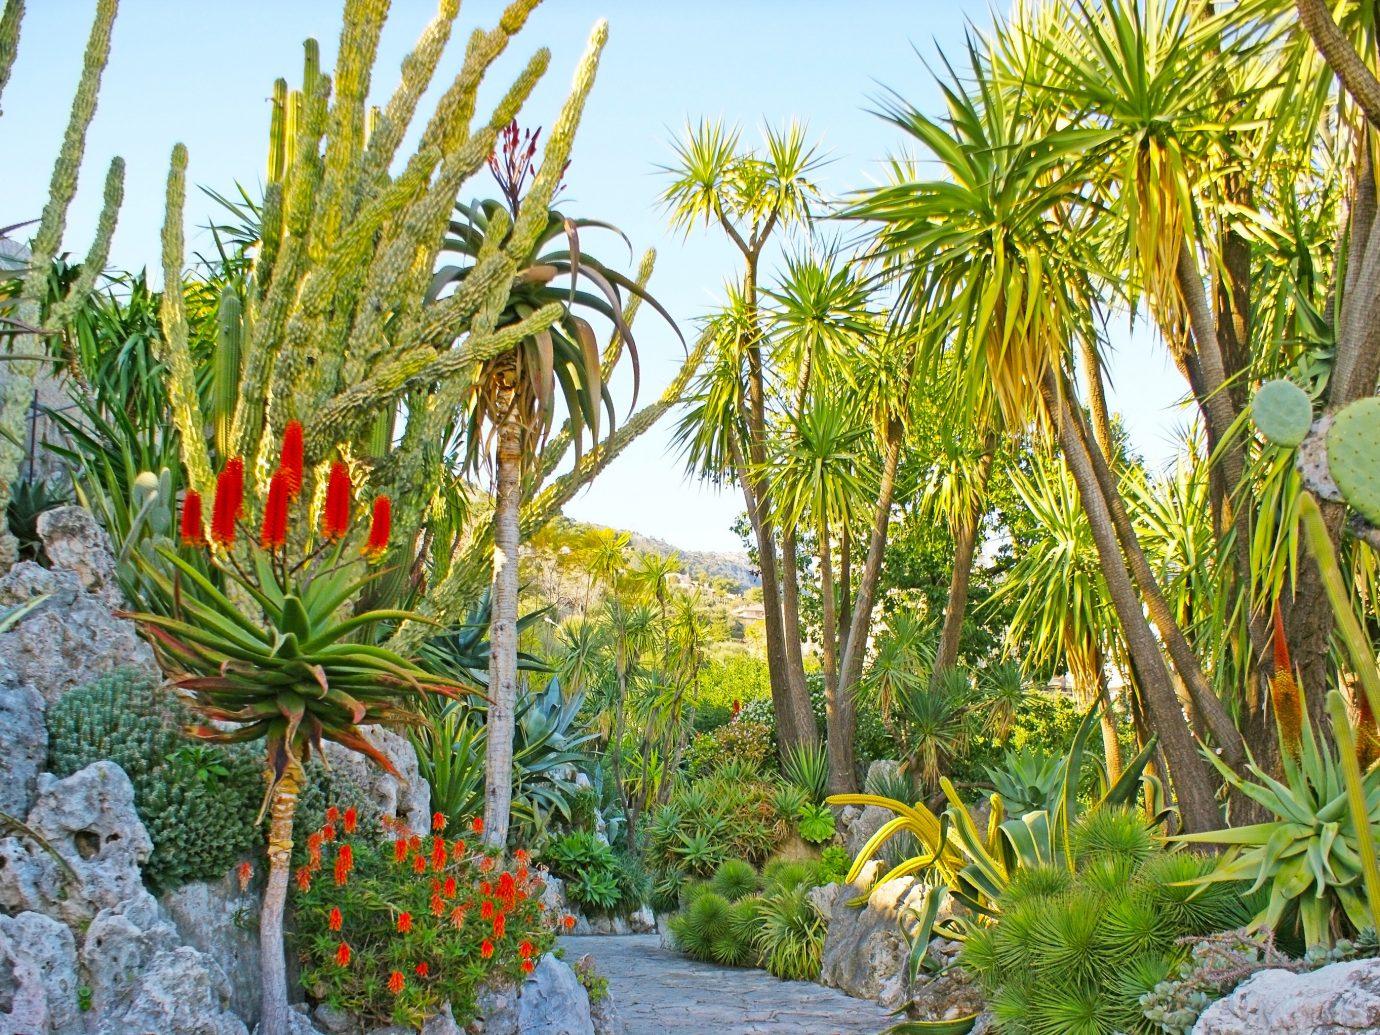 Offbeat Style + Design Travel Trends tree outdoor plant vegetation palm flora arecales botanical garden flower tropics palm tree landscape cactus landscaping Garden flowering plant